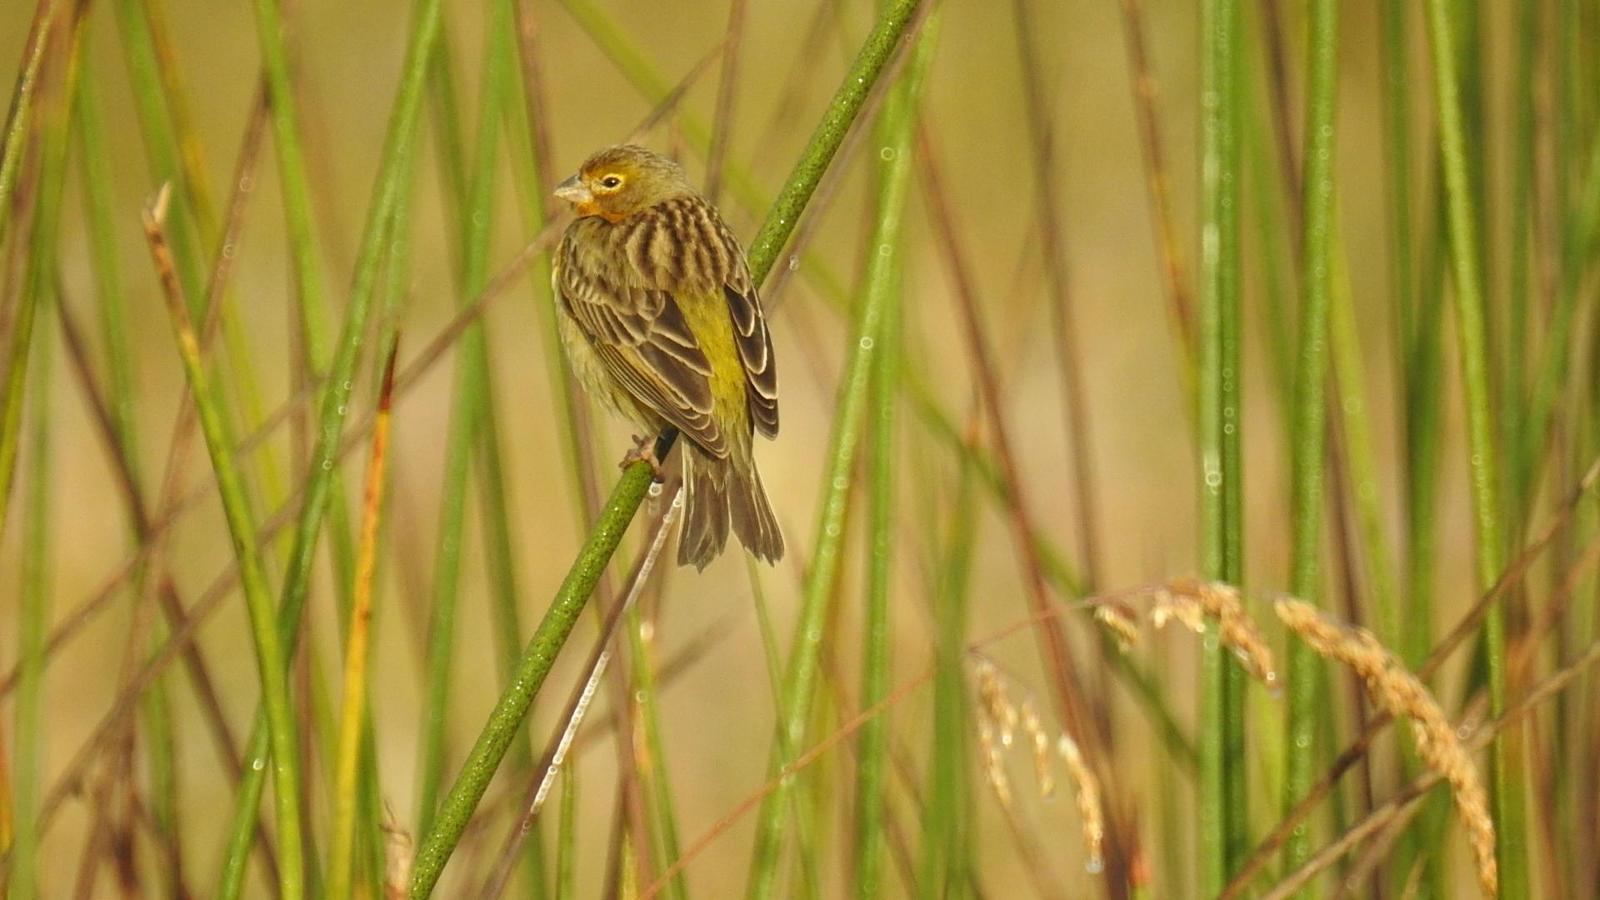 Grassland Yellow-Finch Photo by Julio Delgado